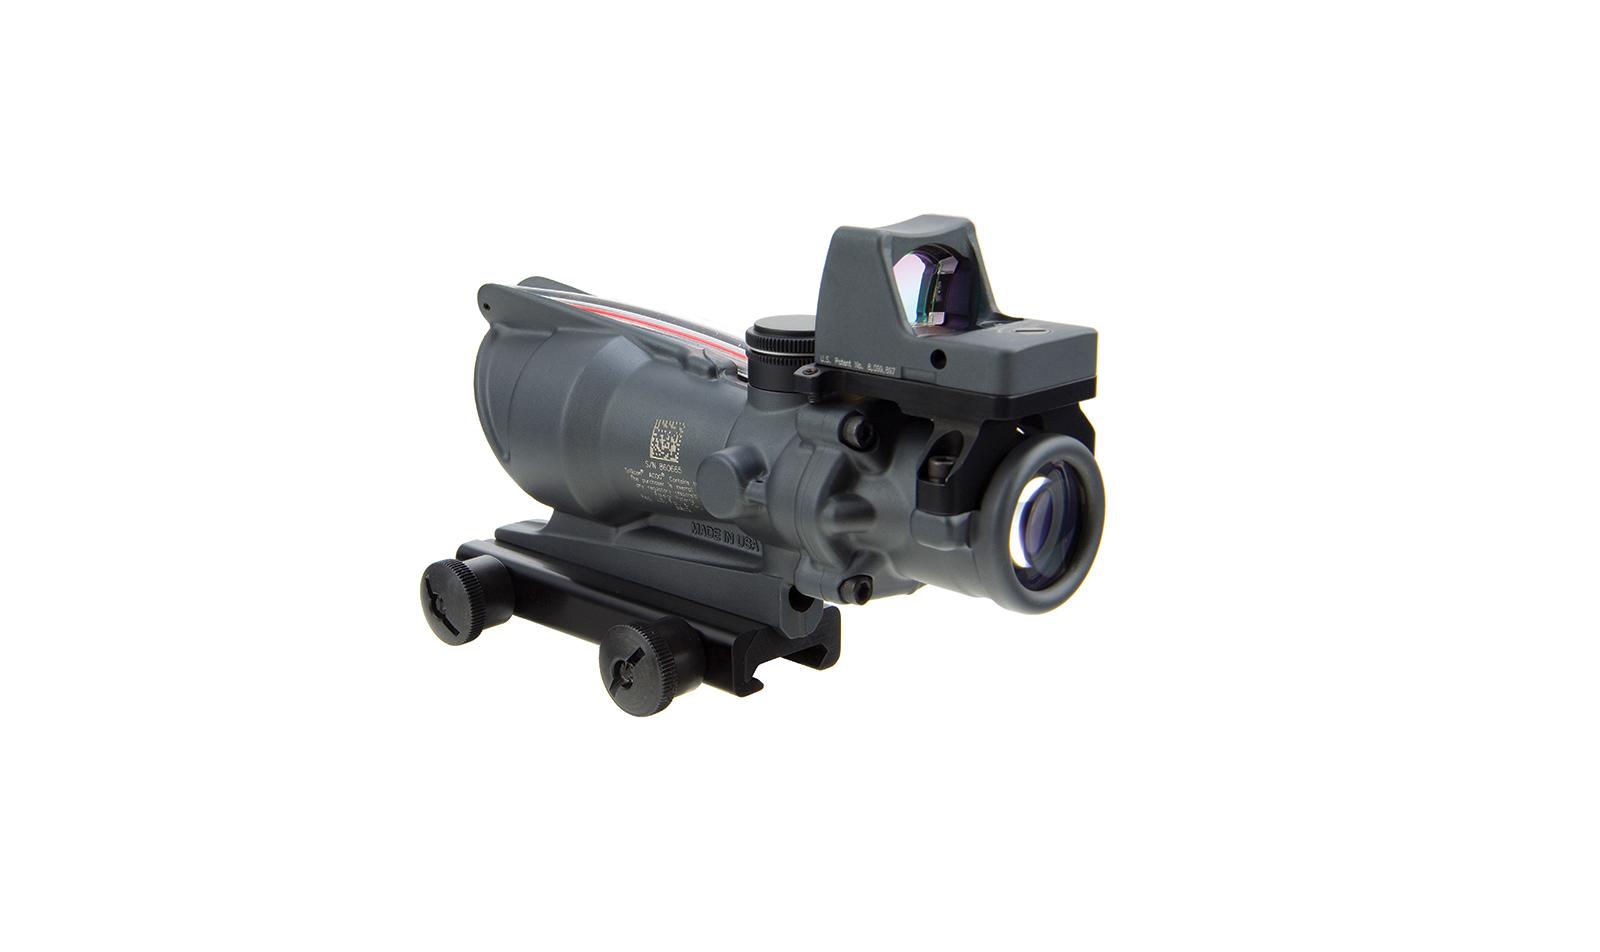 TA31-D-100568 angle 3